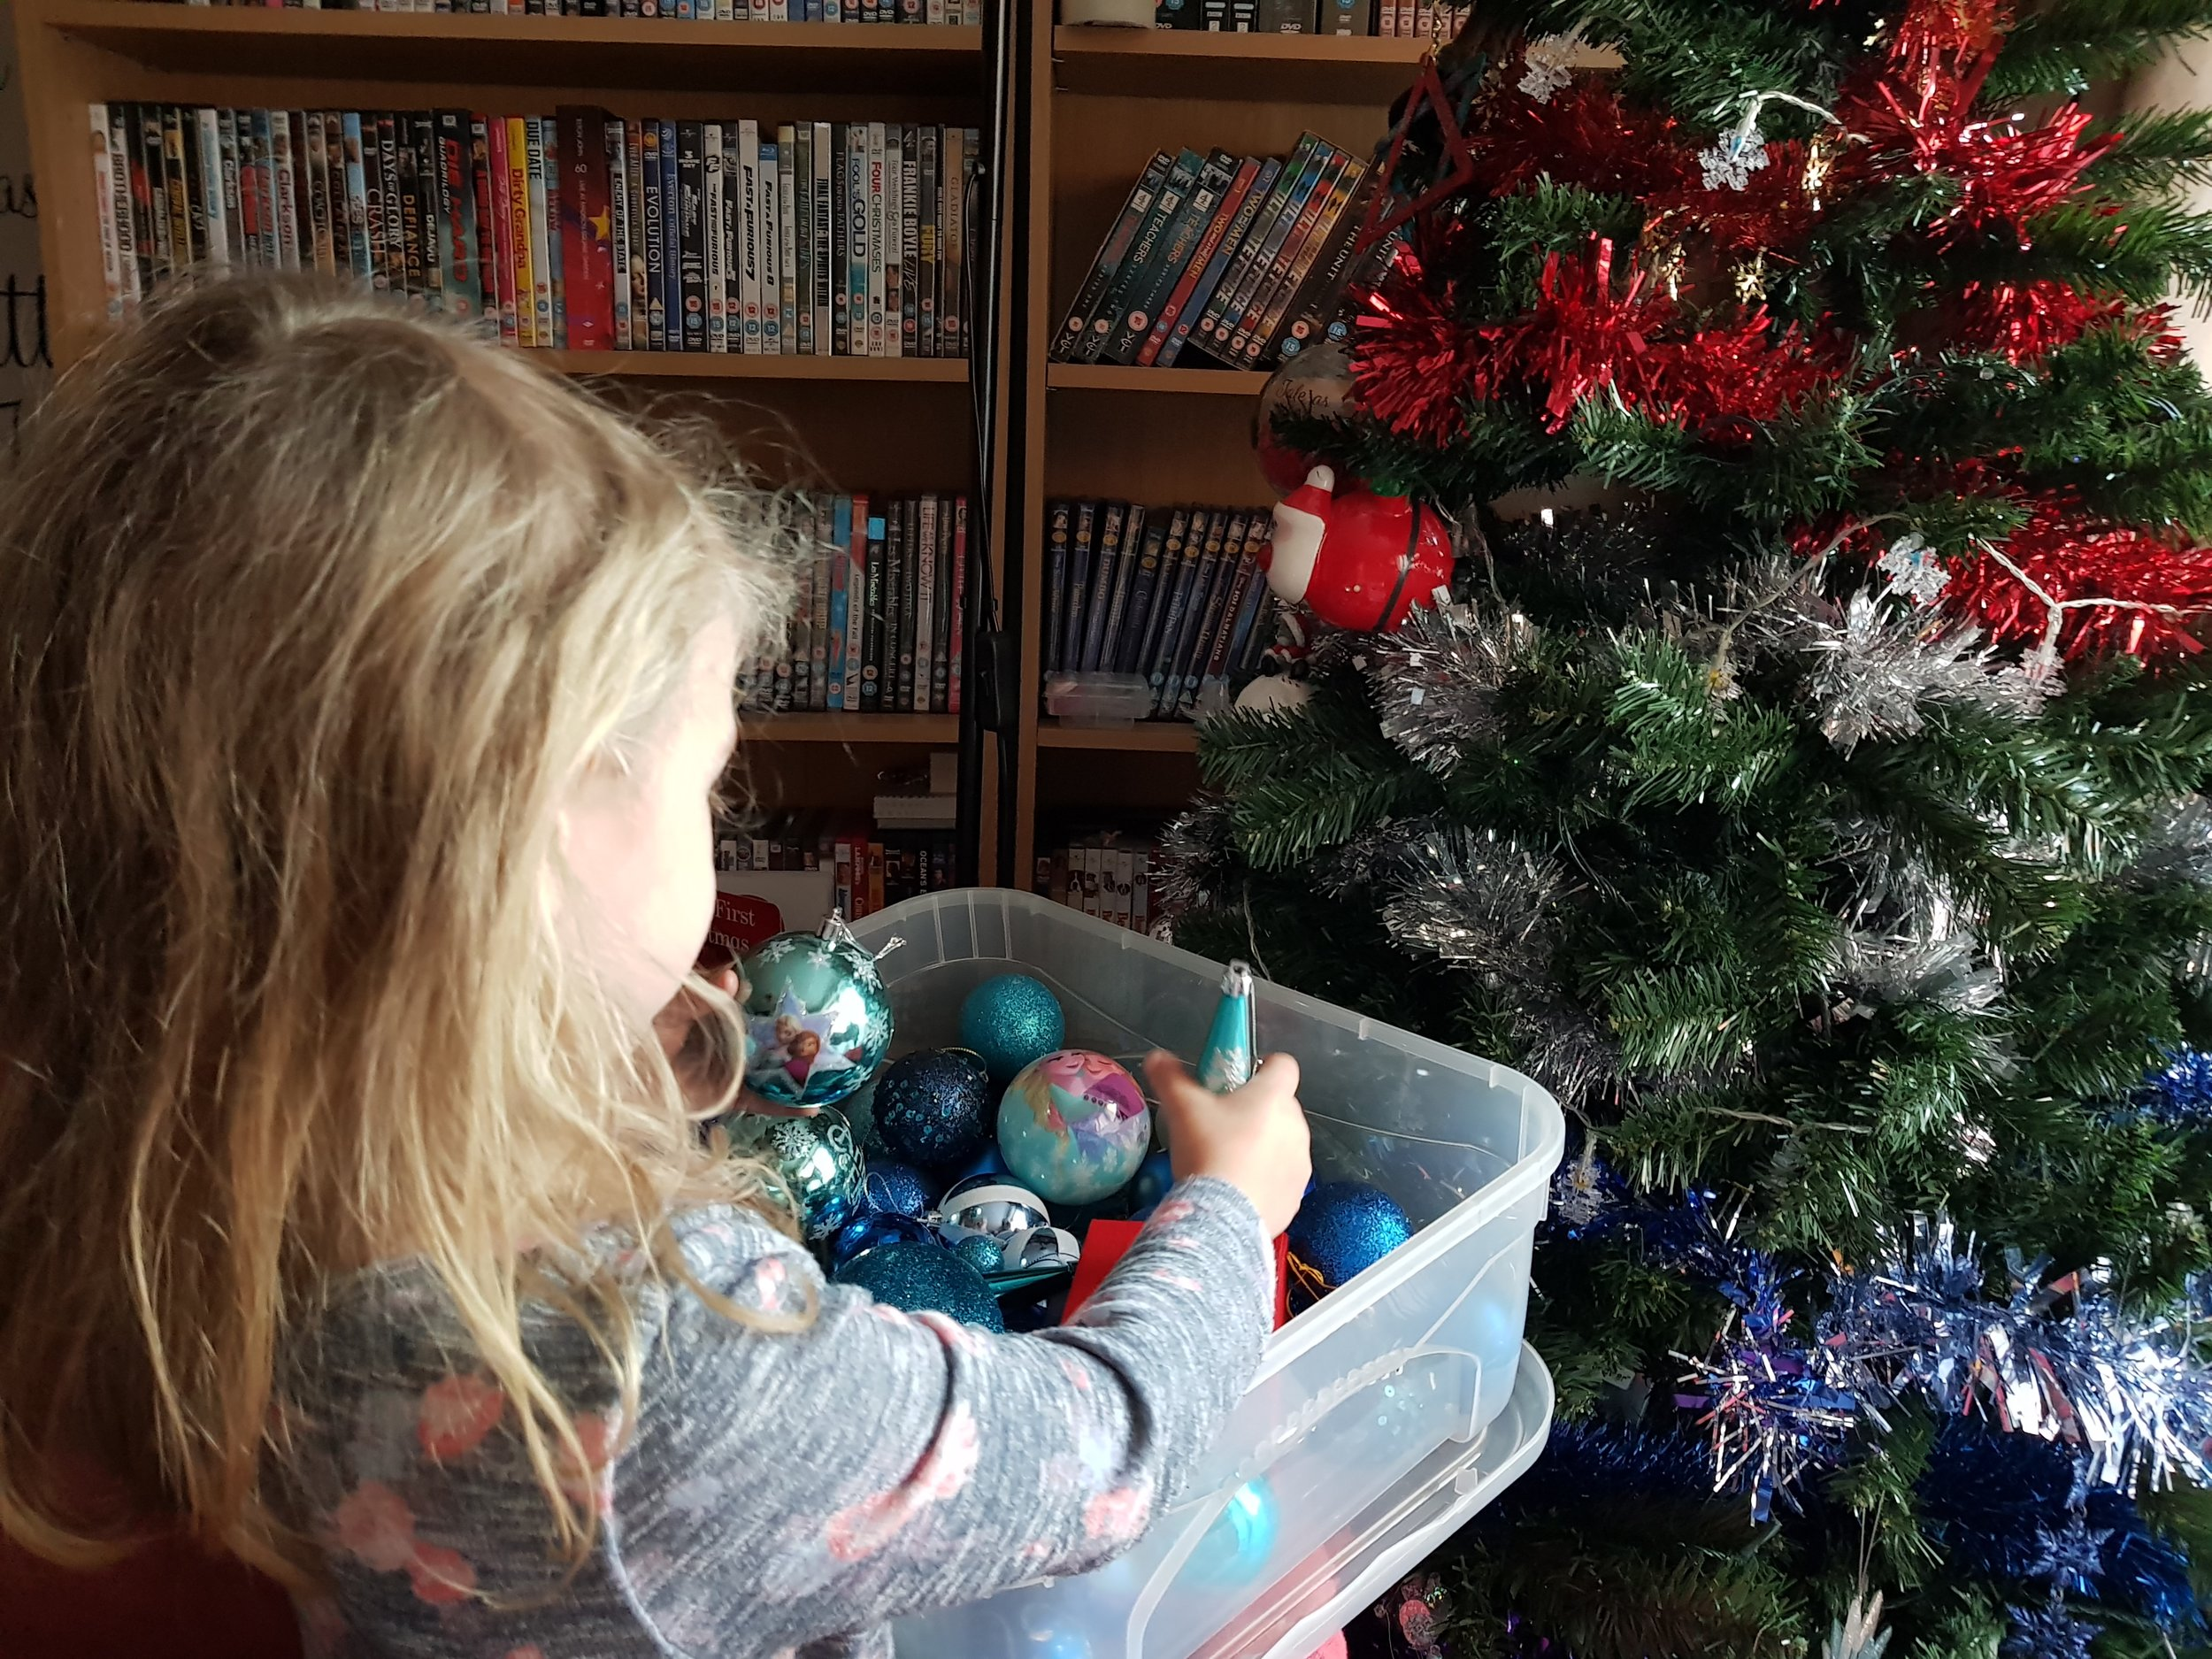 Taking down Christmas